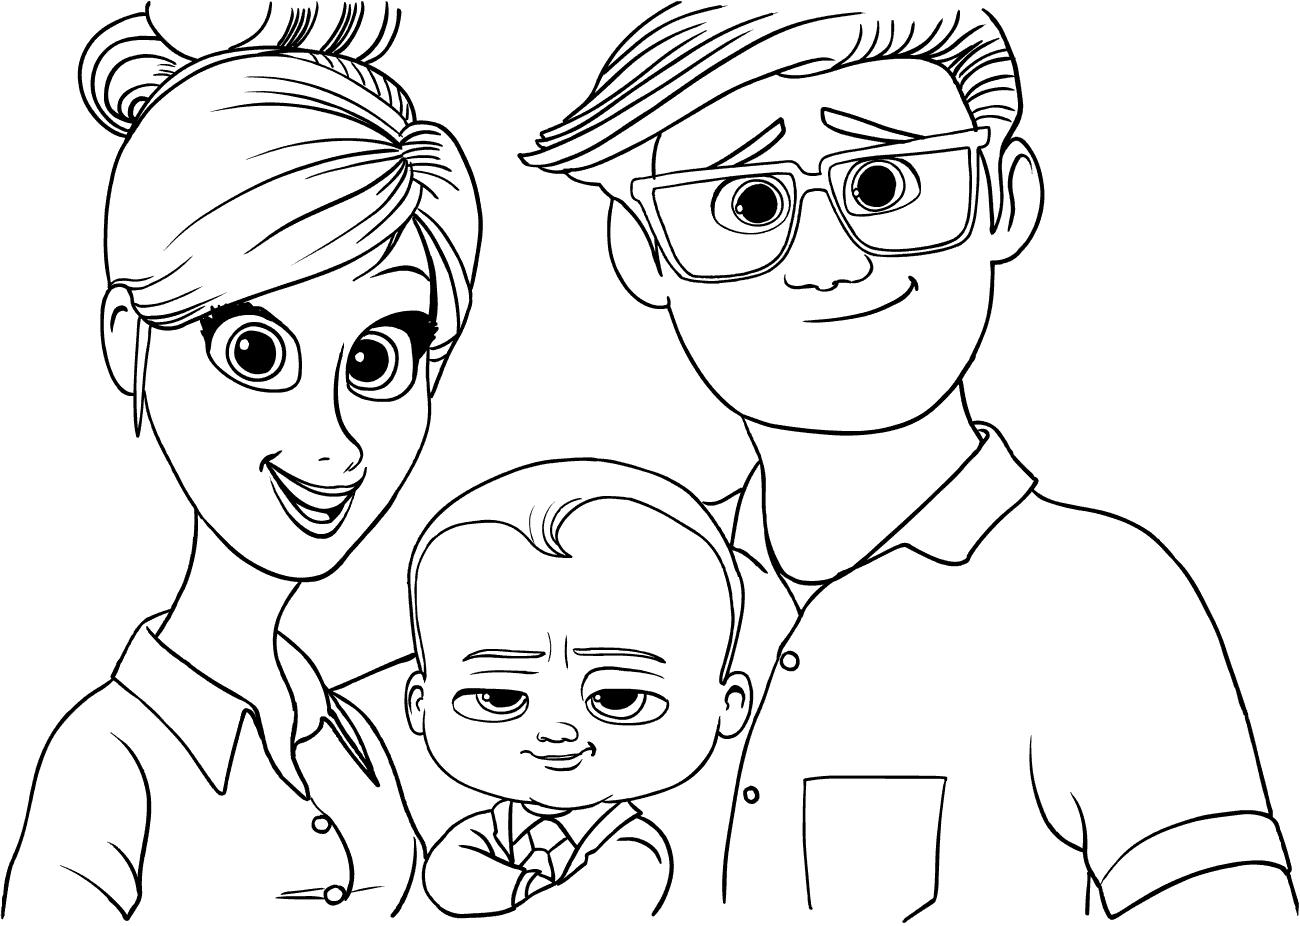 Папа рисунок карандашом